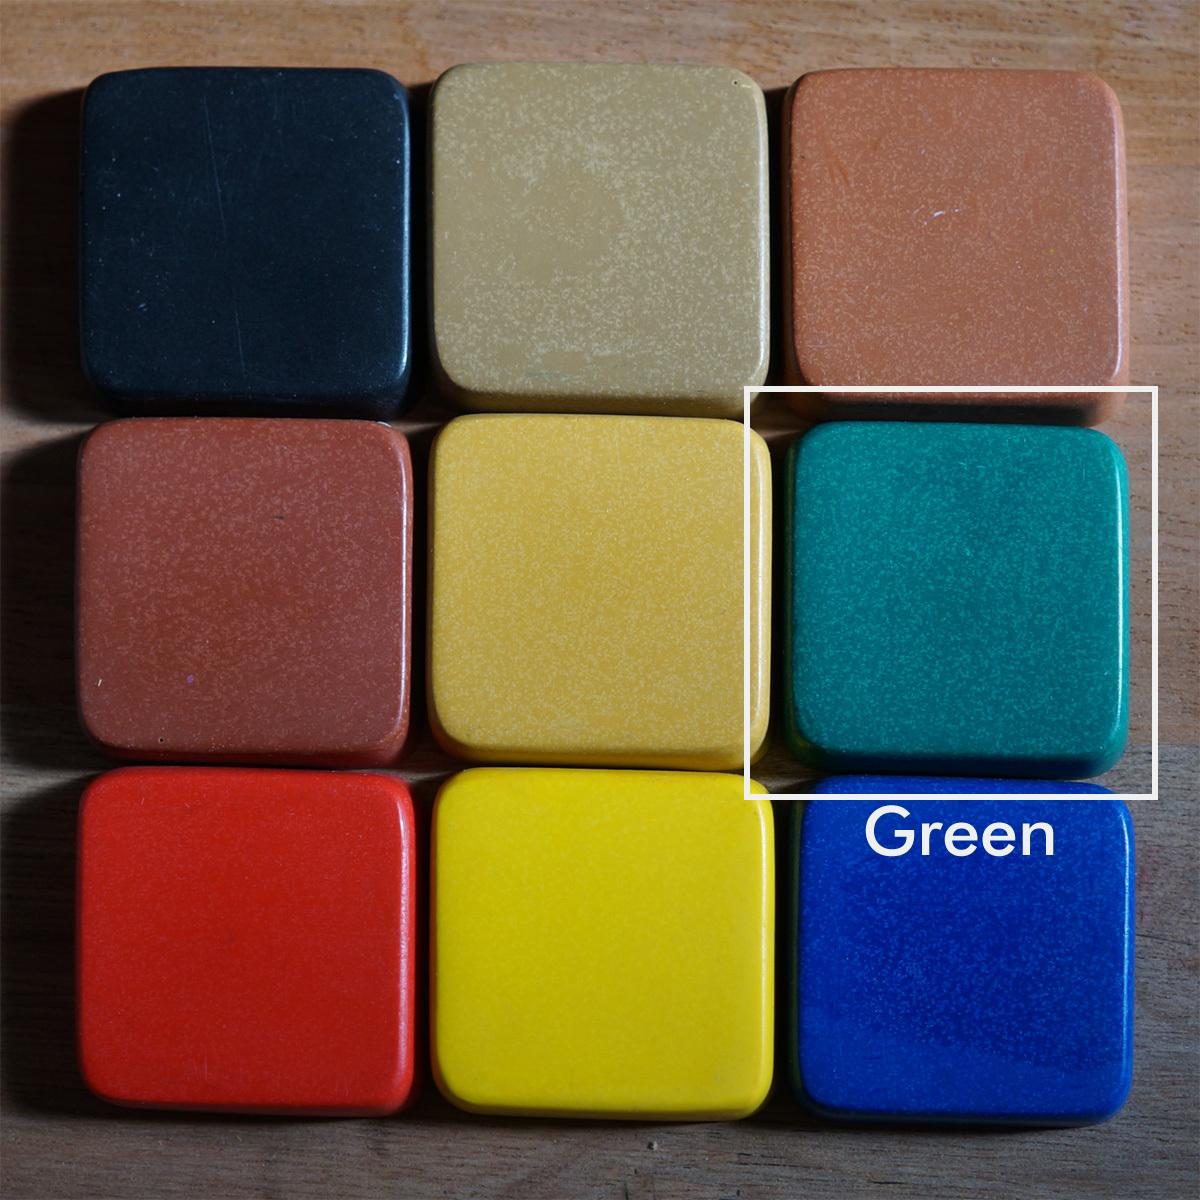 PIGMENT GREEN 200g(着色剤:緑 200g) - 画像2